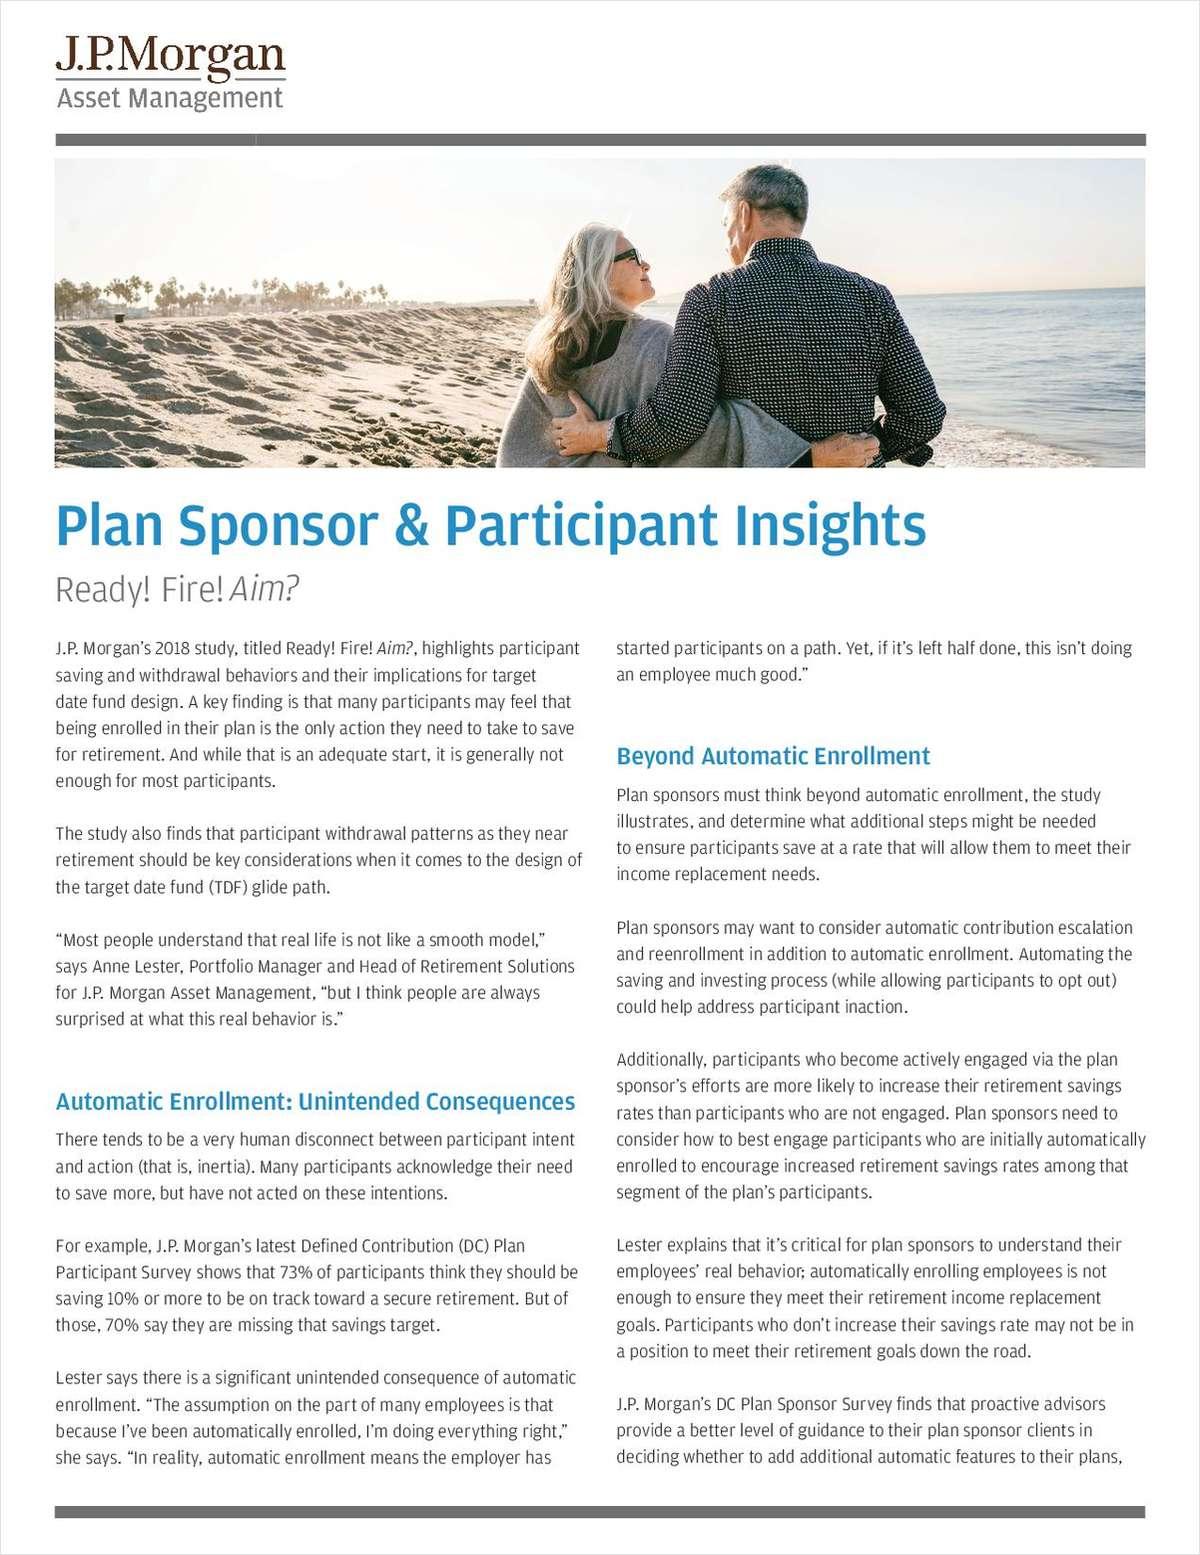 Plan Sponsor & Participant Insights: Ready! Fire! Aim?